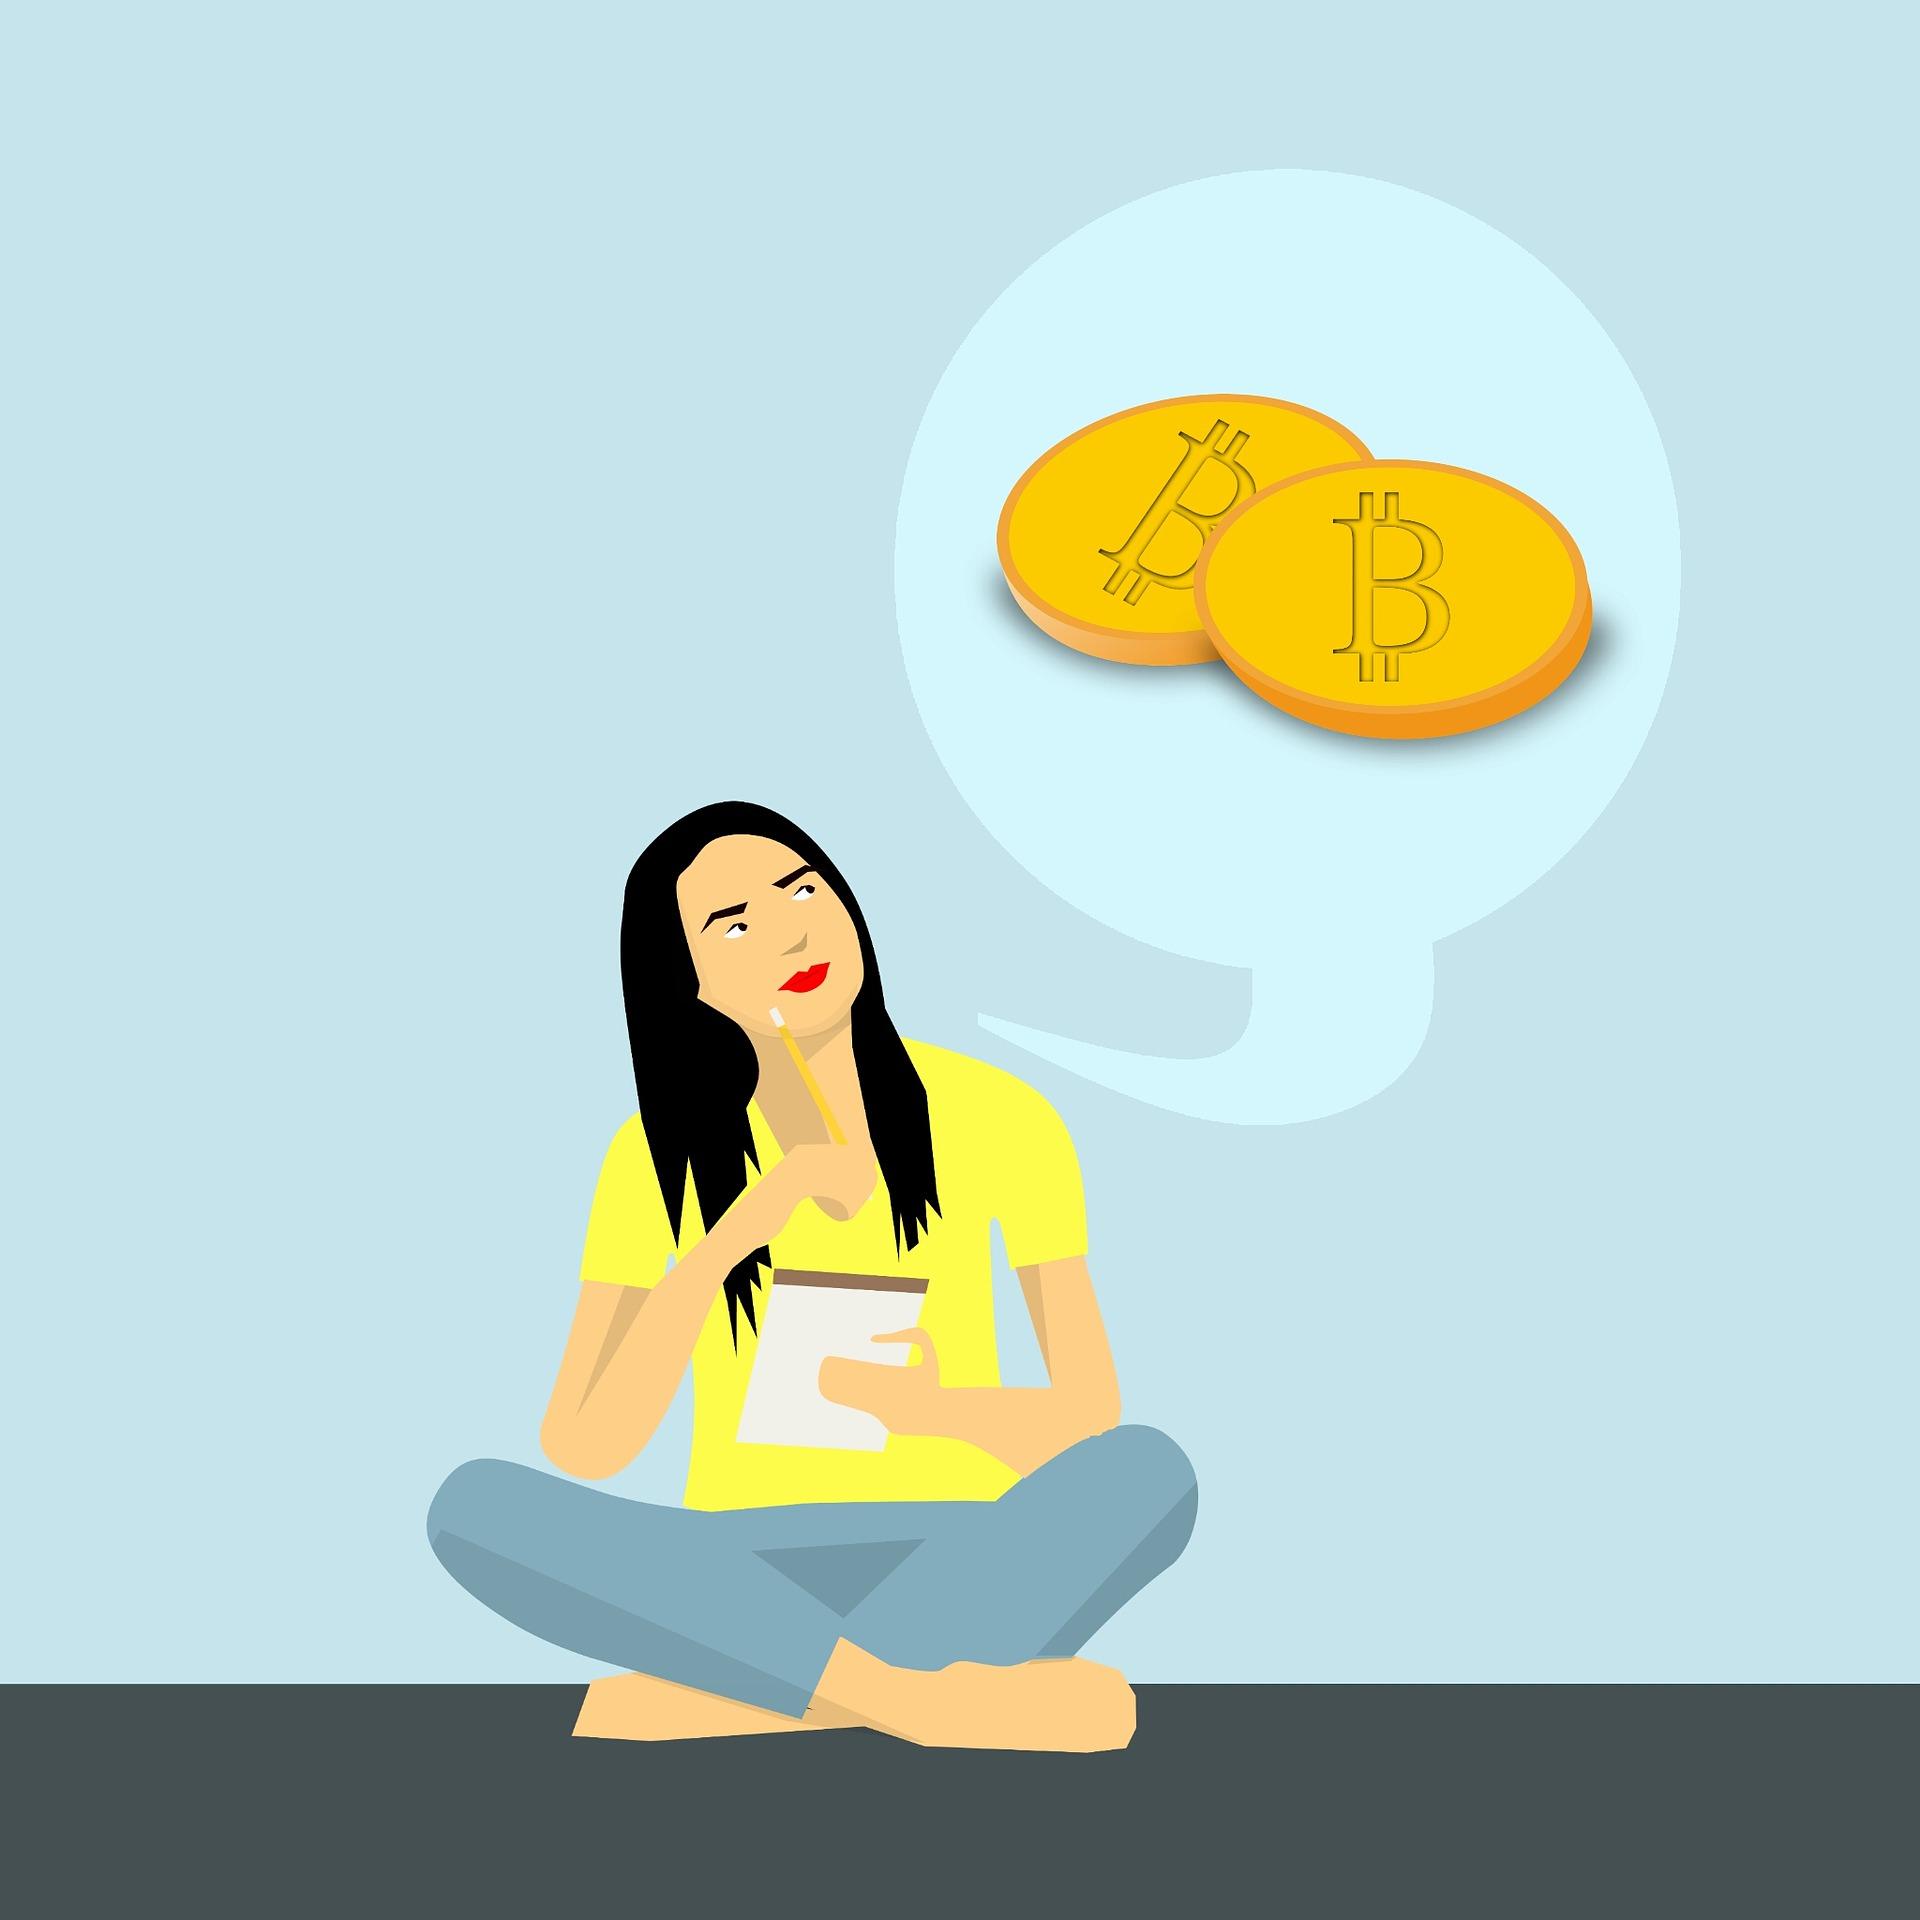 Ist Bitcoin Profit Betrug?